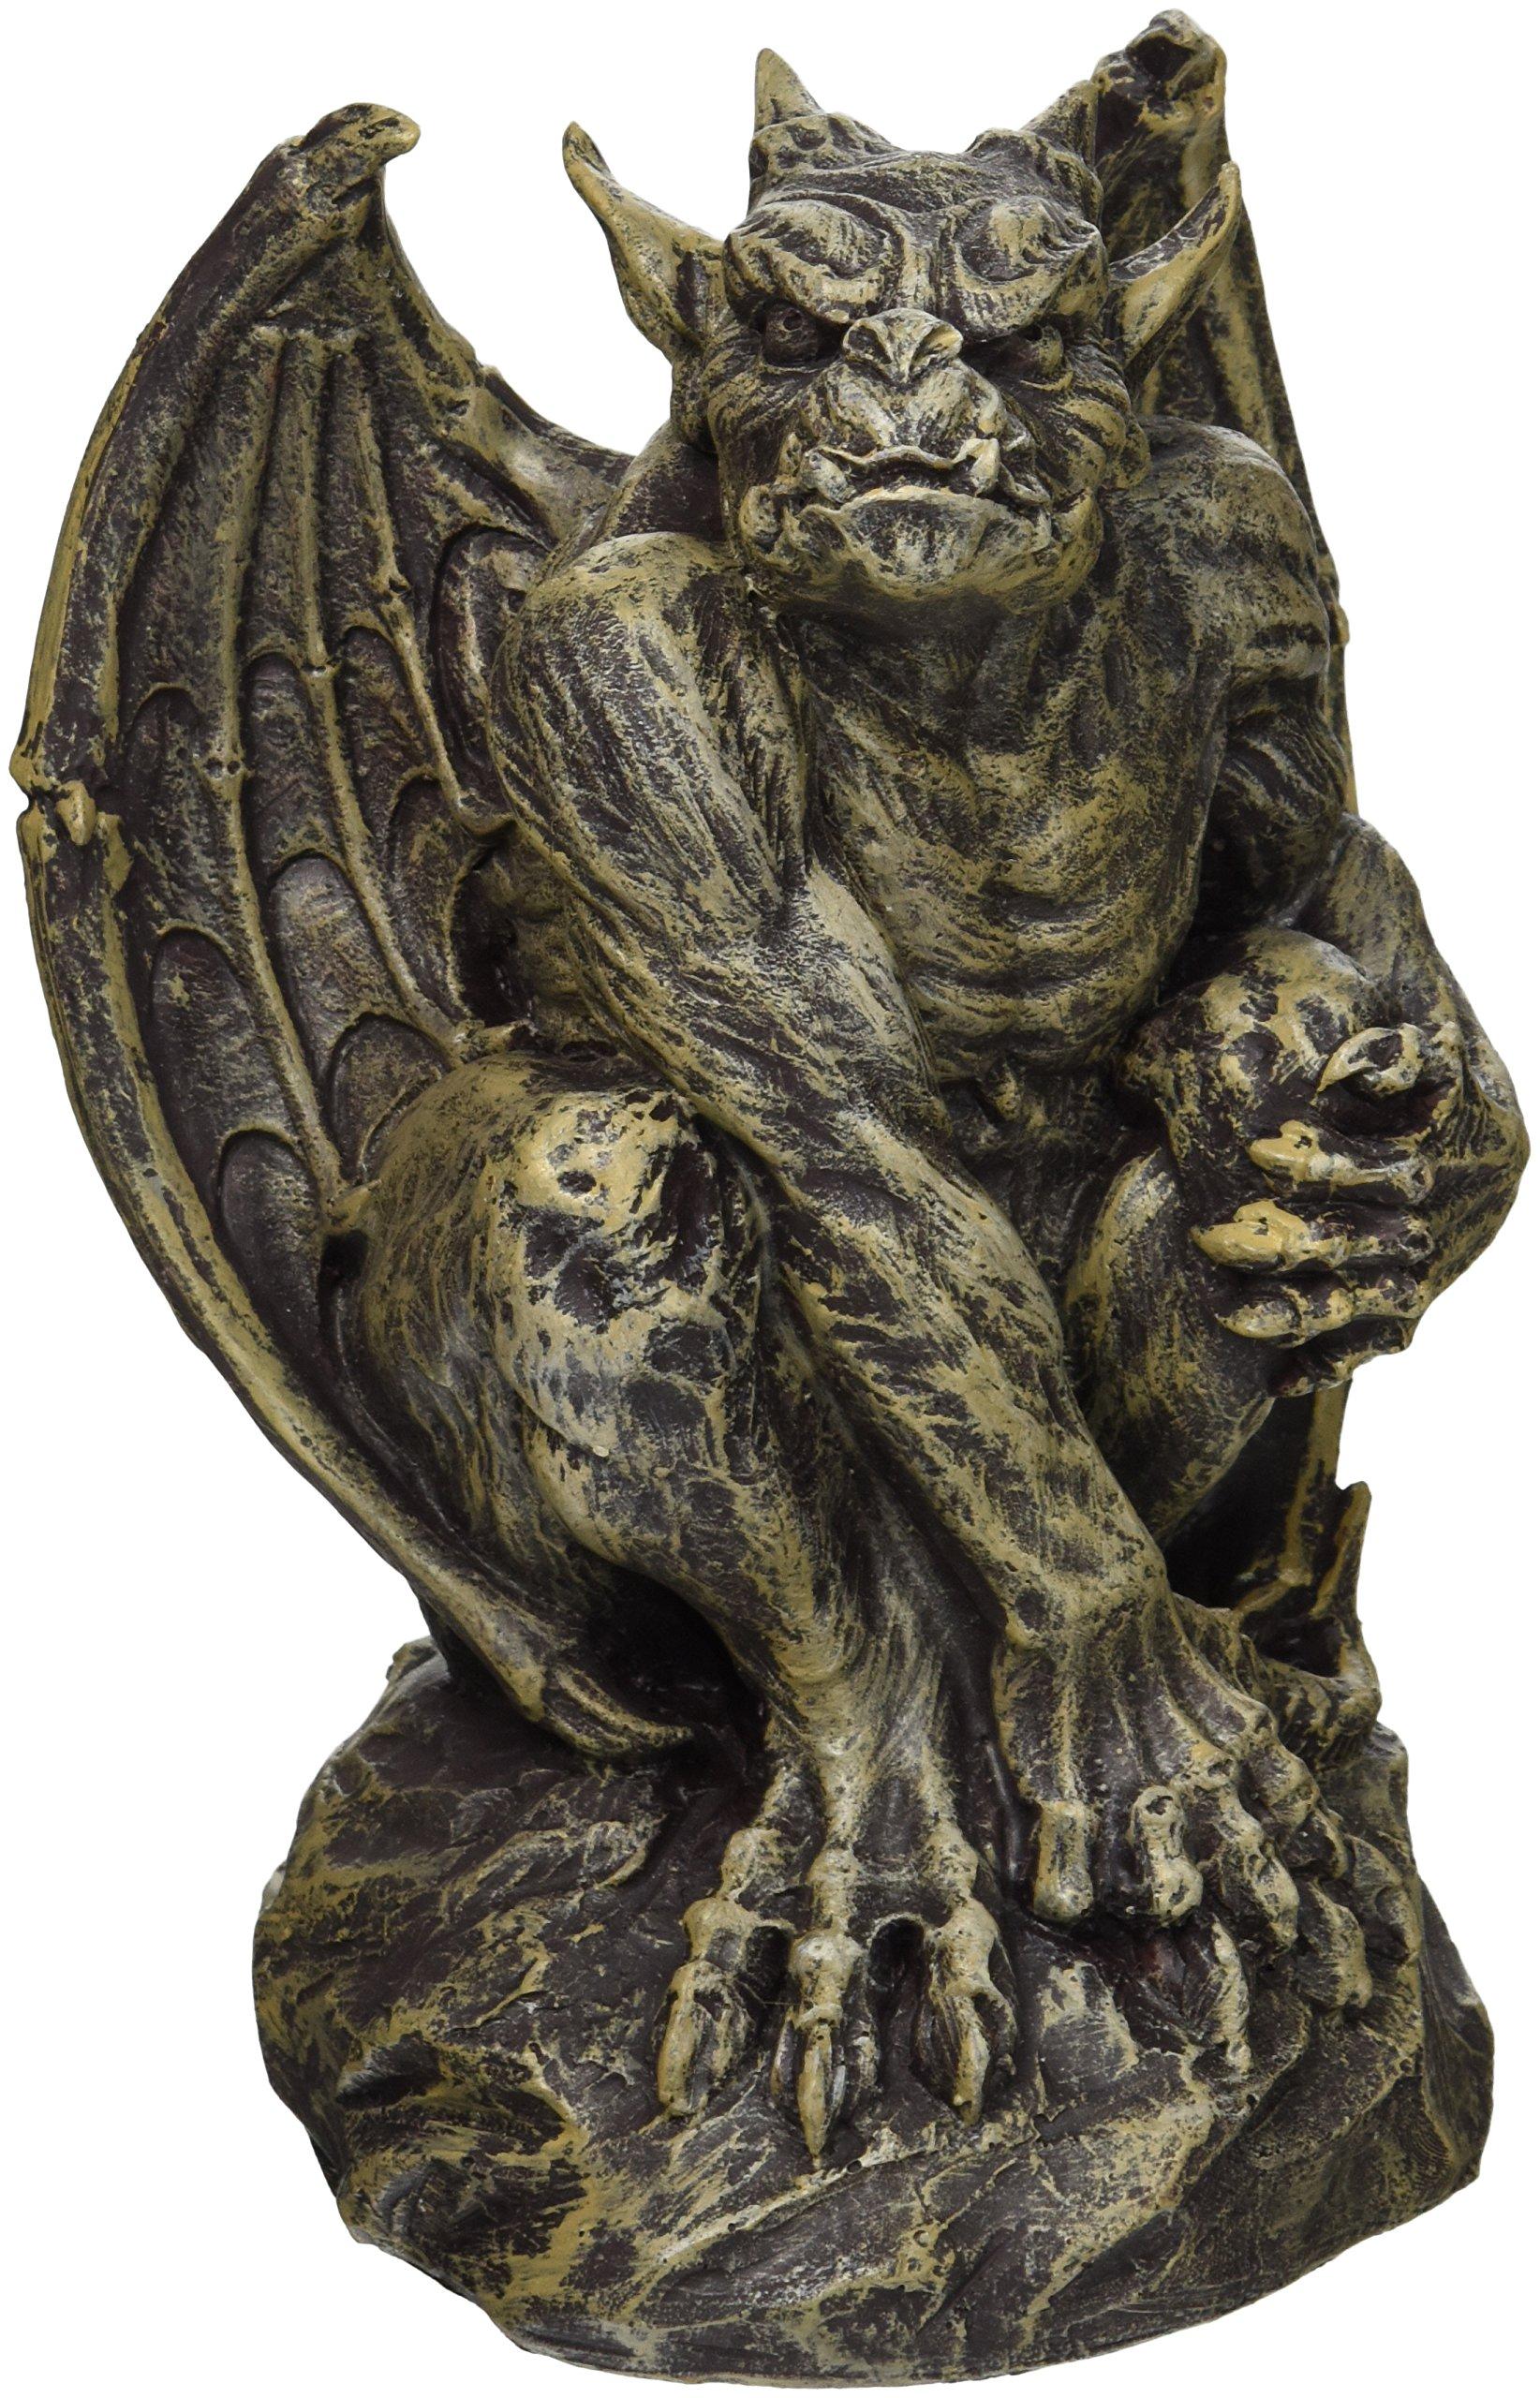 Design Toscano CL5199 Silas the Sentry Gargoyle Gothic Statue, Medium, 18 cm, Polyresin, Two Tone Stone